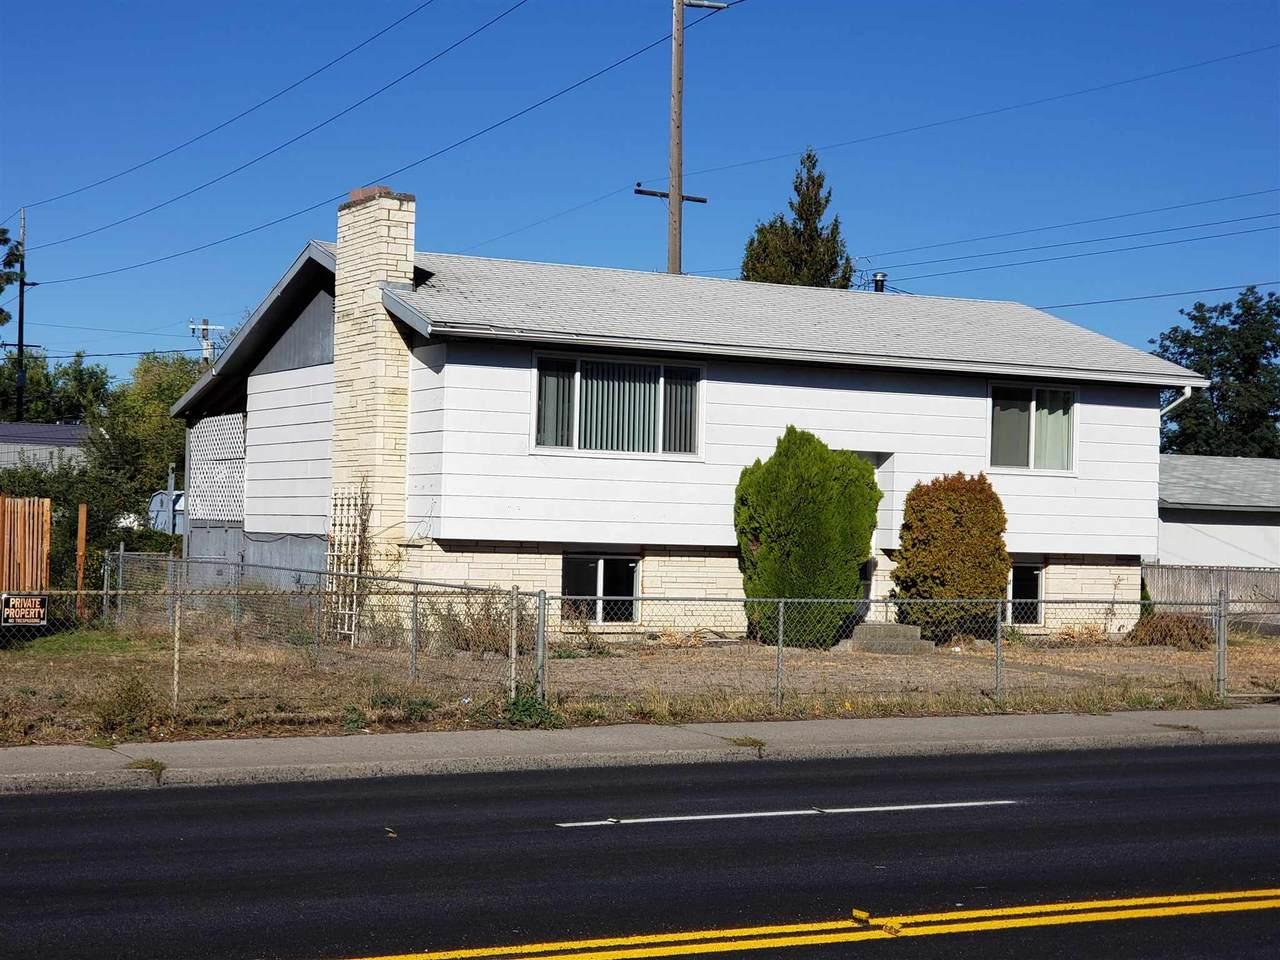 6109 Nevada St - Photo 1